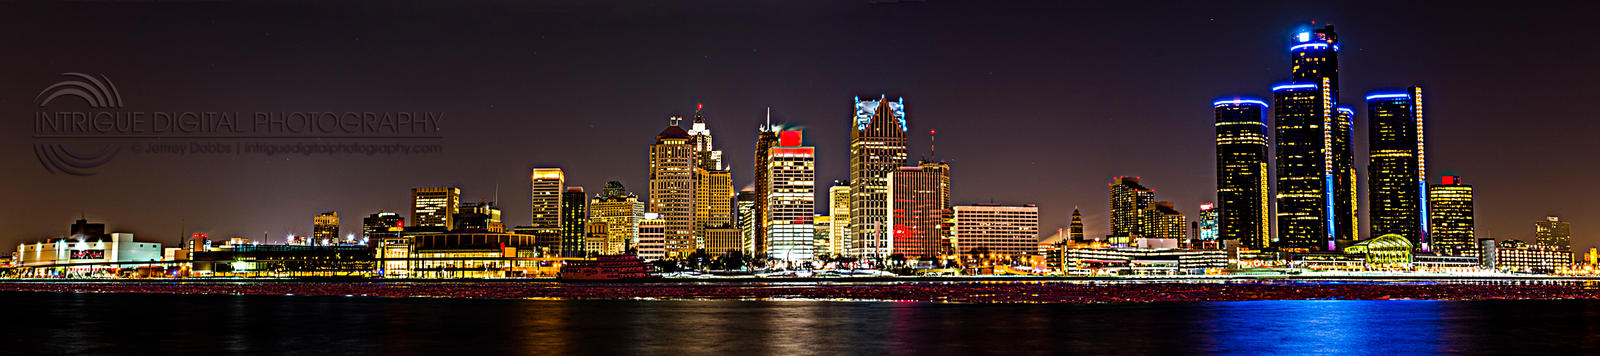 Detroit Lights by JeffreyDobbs